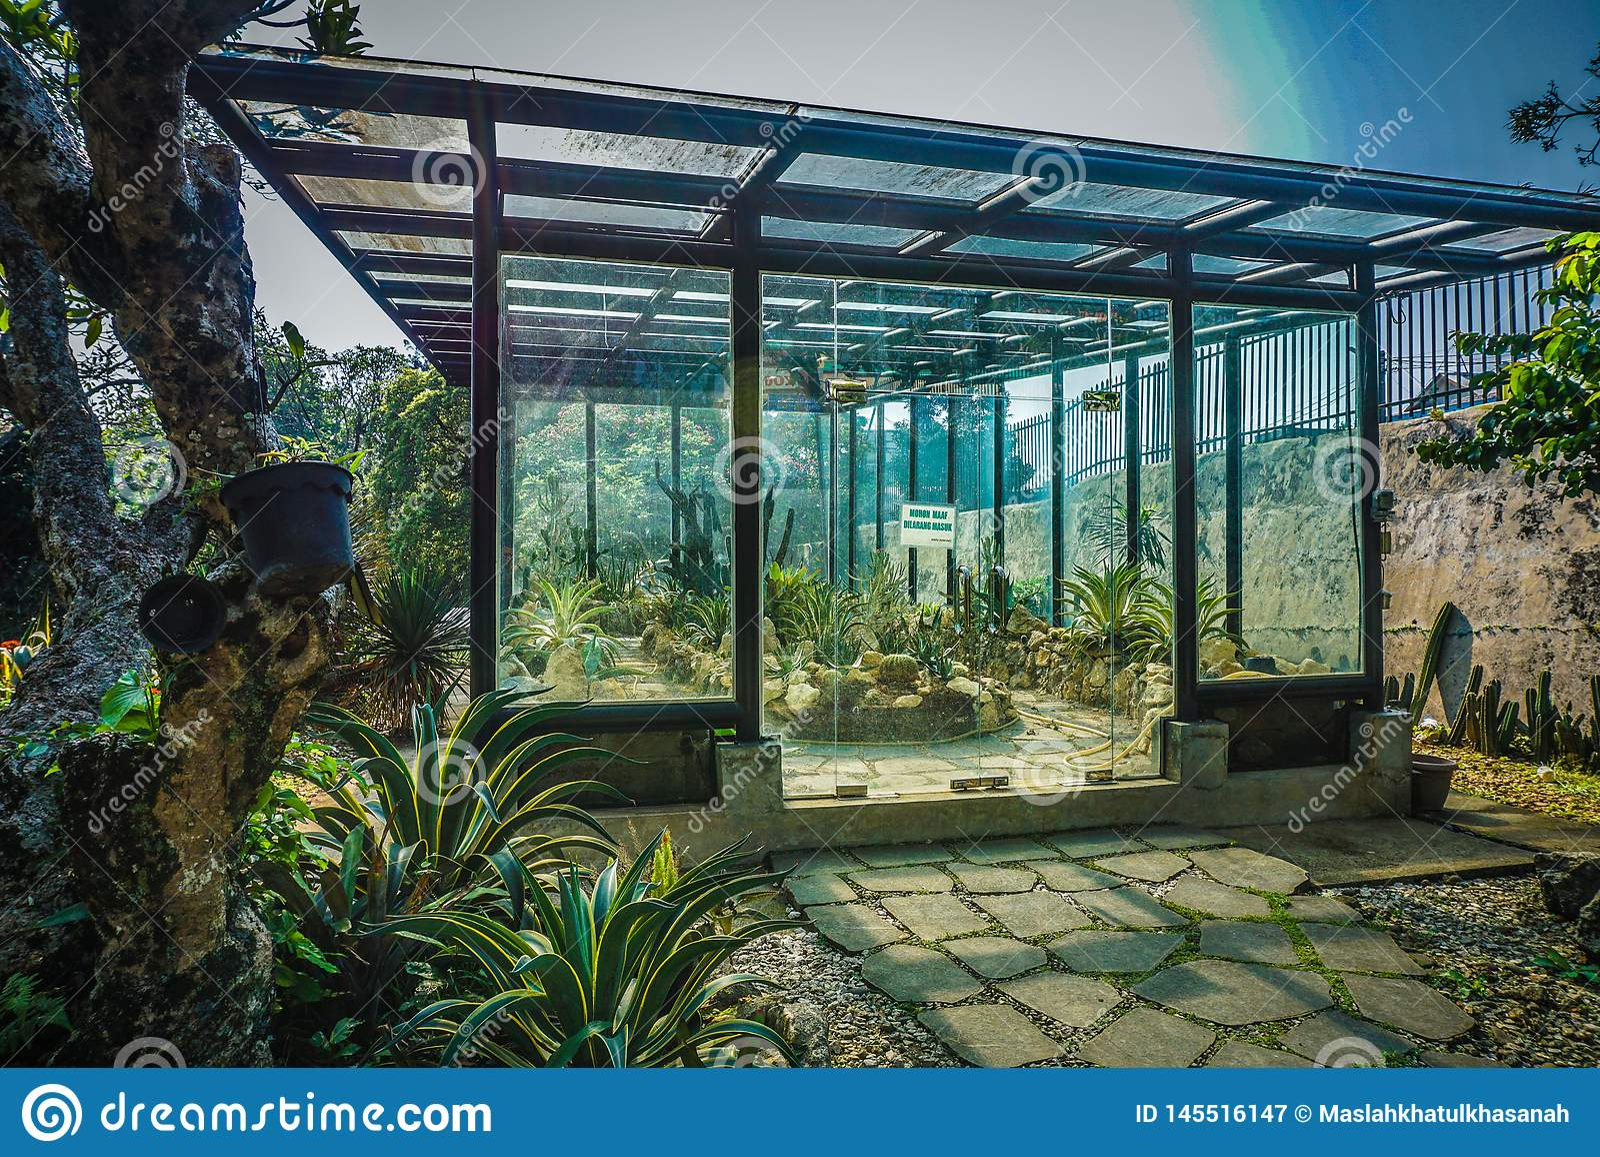 Glashuis om cactus te kweken om temperatuur in bogorpark warm te houden - foto